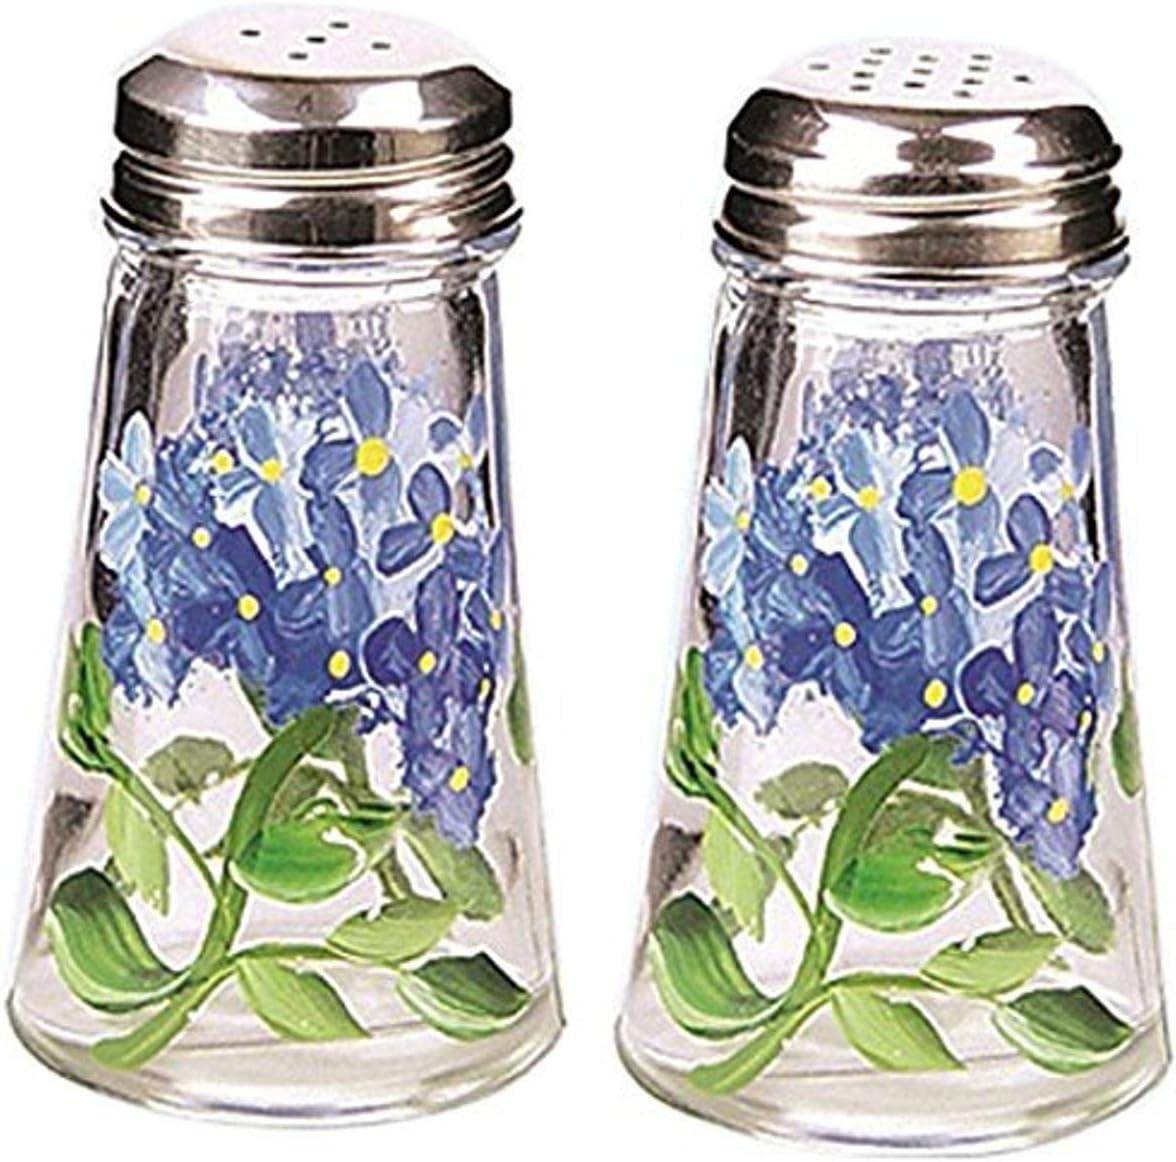 Grant Howard Hand Painted Tapered Salt and Pepper Shaker Set, Blue Hydrangeas, Blue